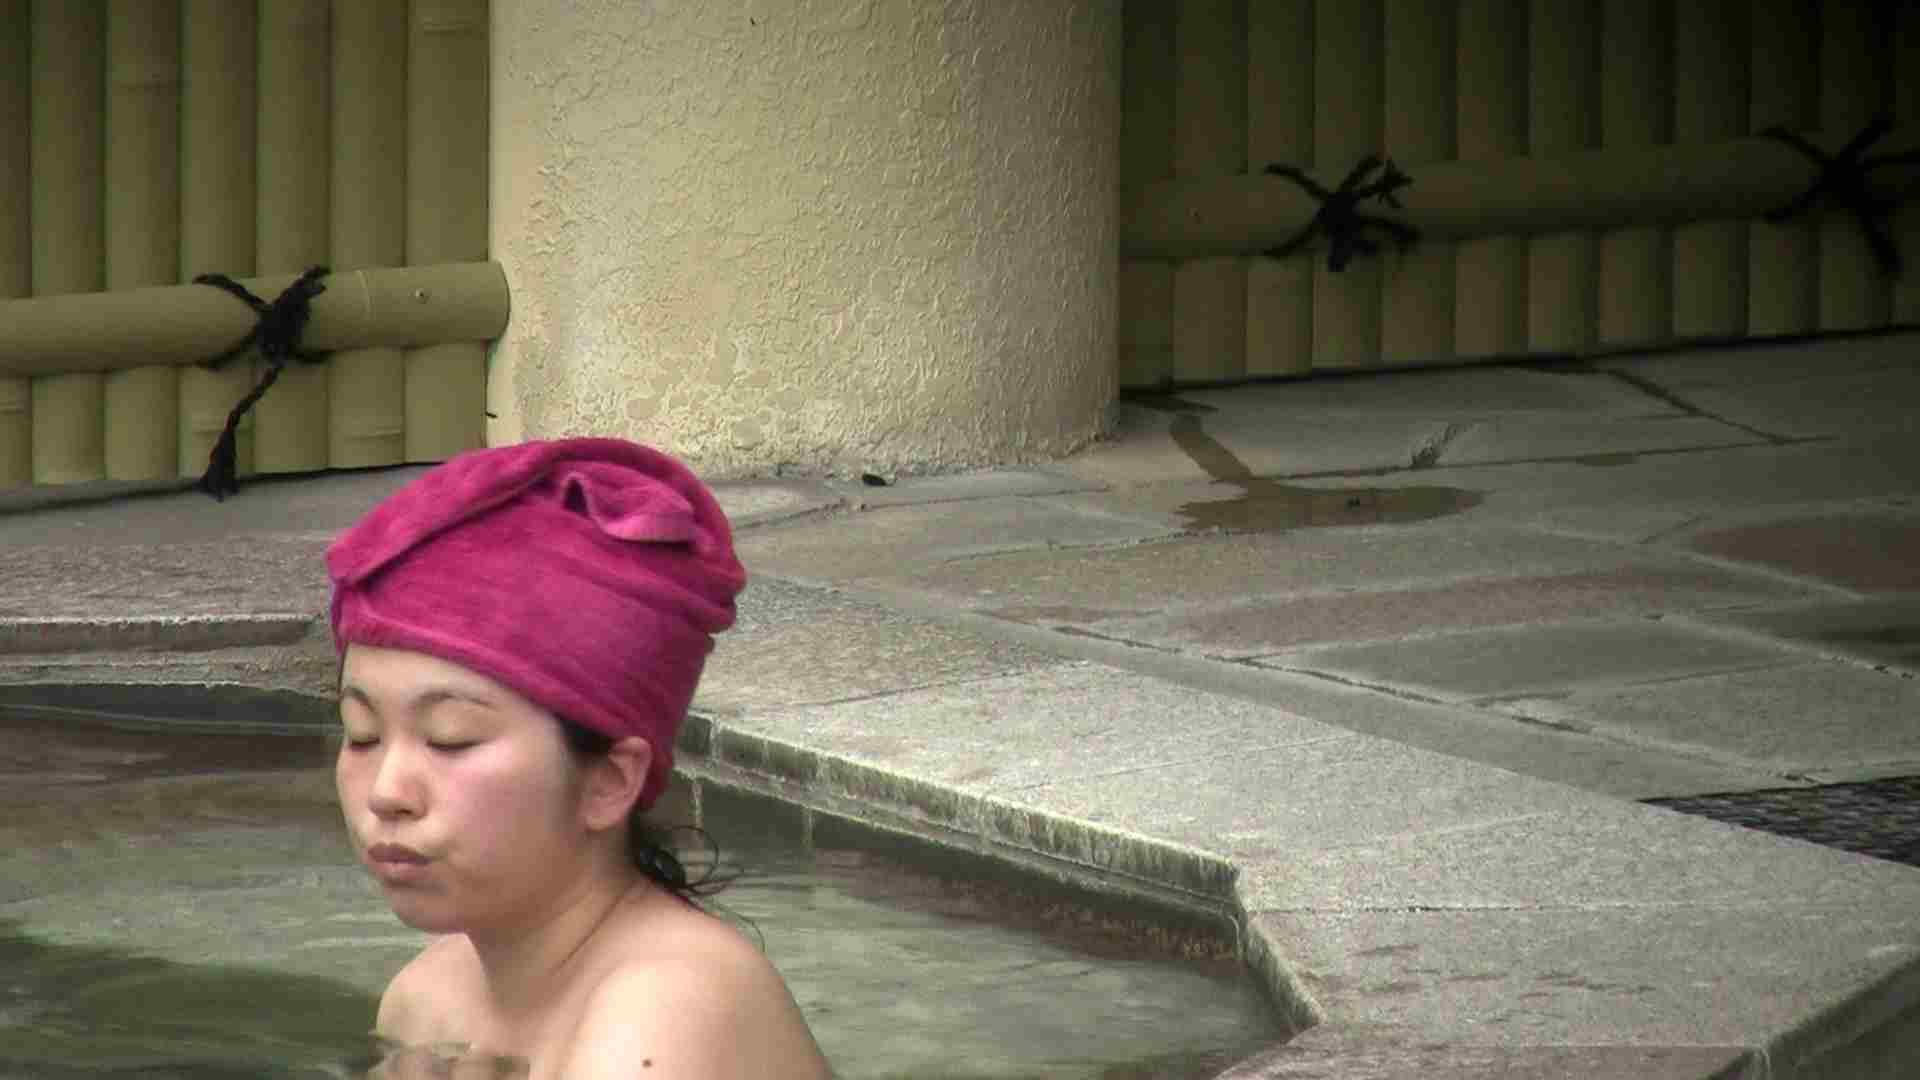 Aquaな露天風呂Vol.186 盗撮 | HなOL  78pic 7